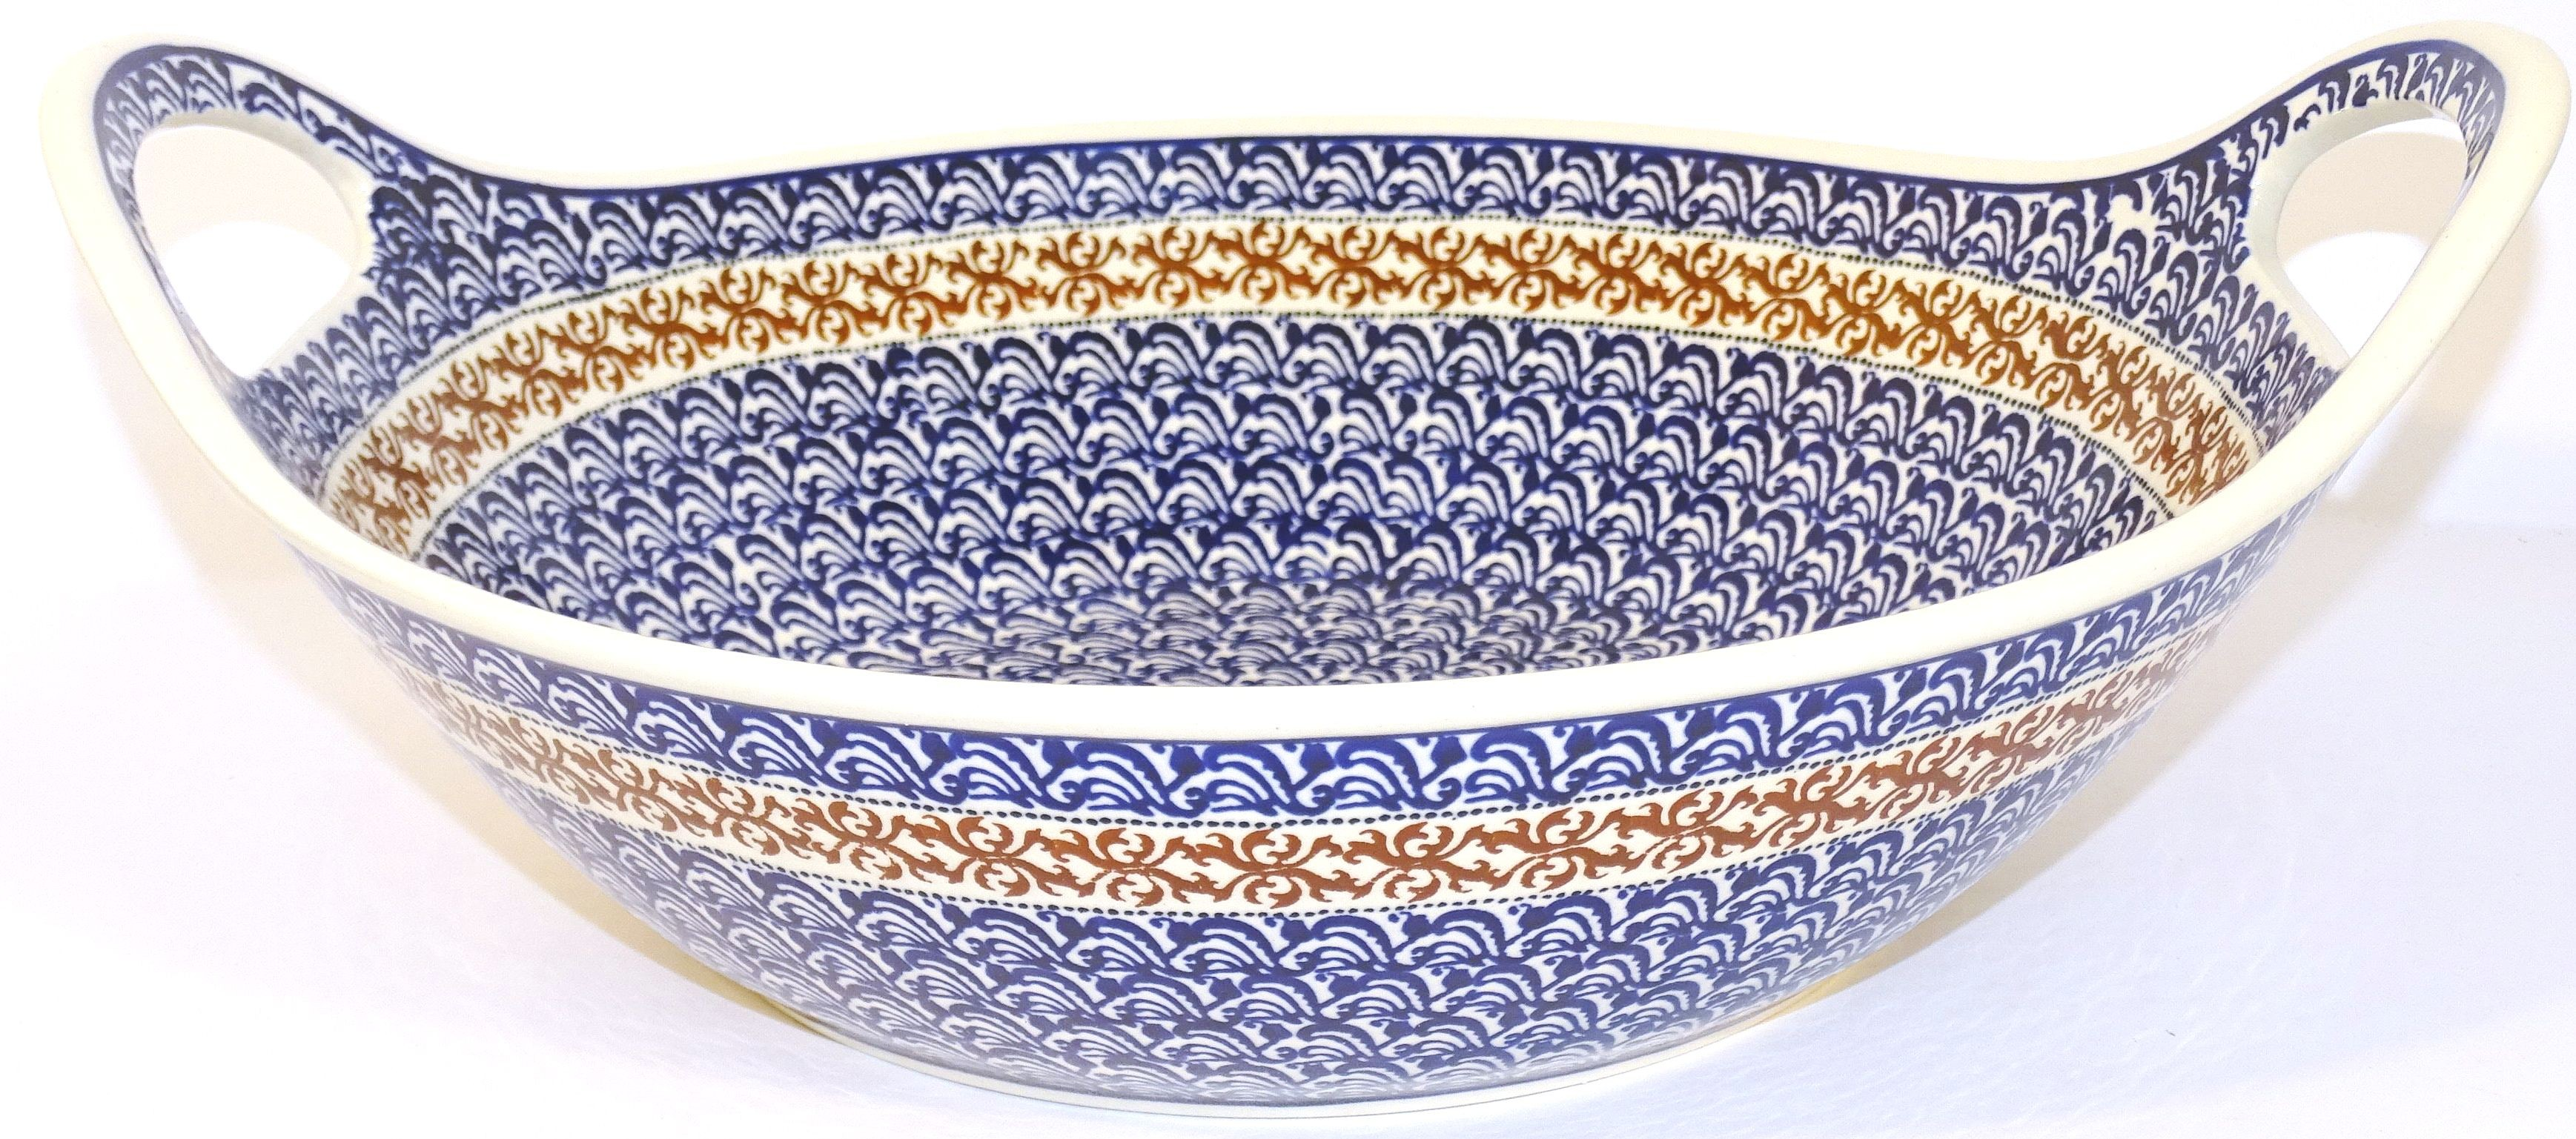 "Pottery Avenue 13"" Handled Bowl-Baker | CLASSIC"